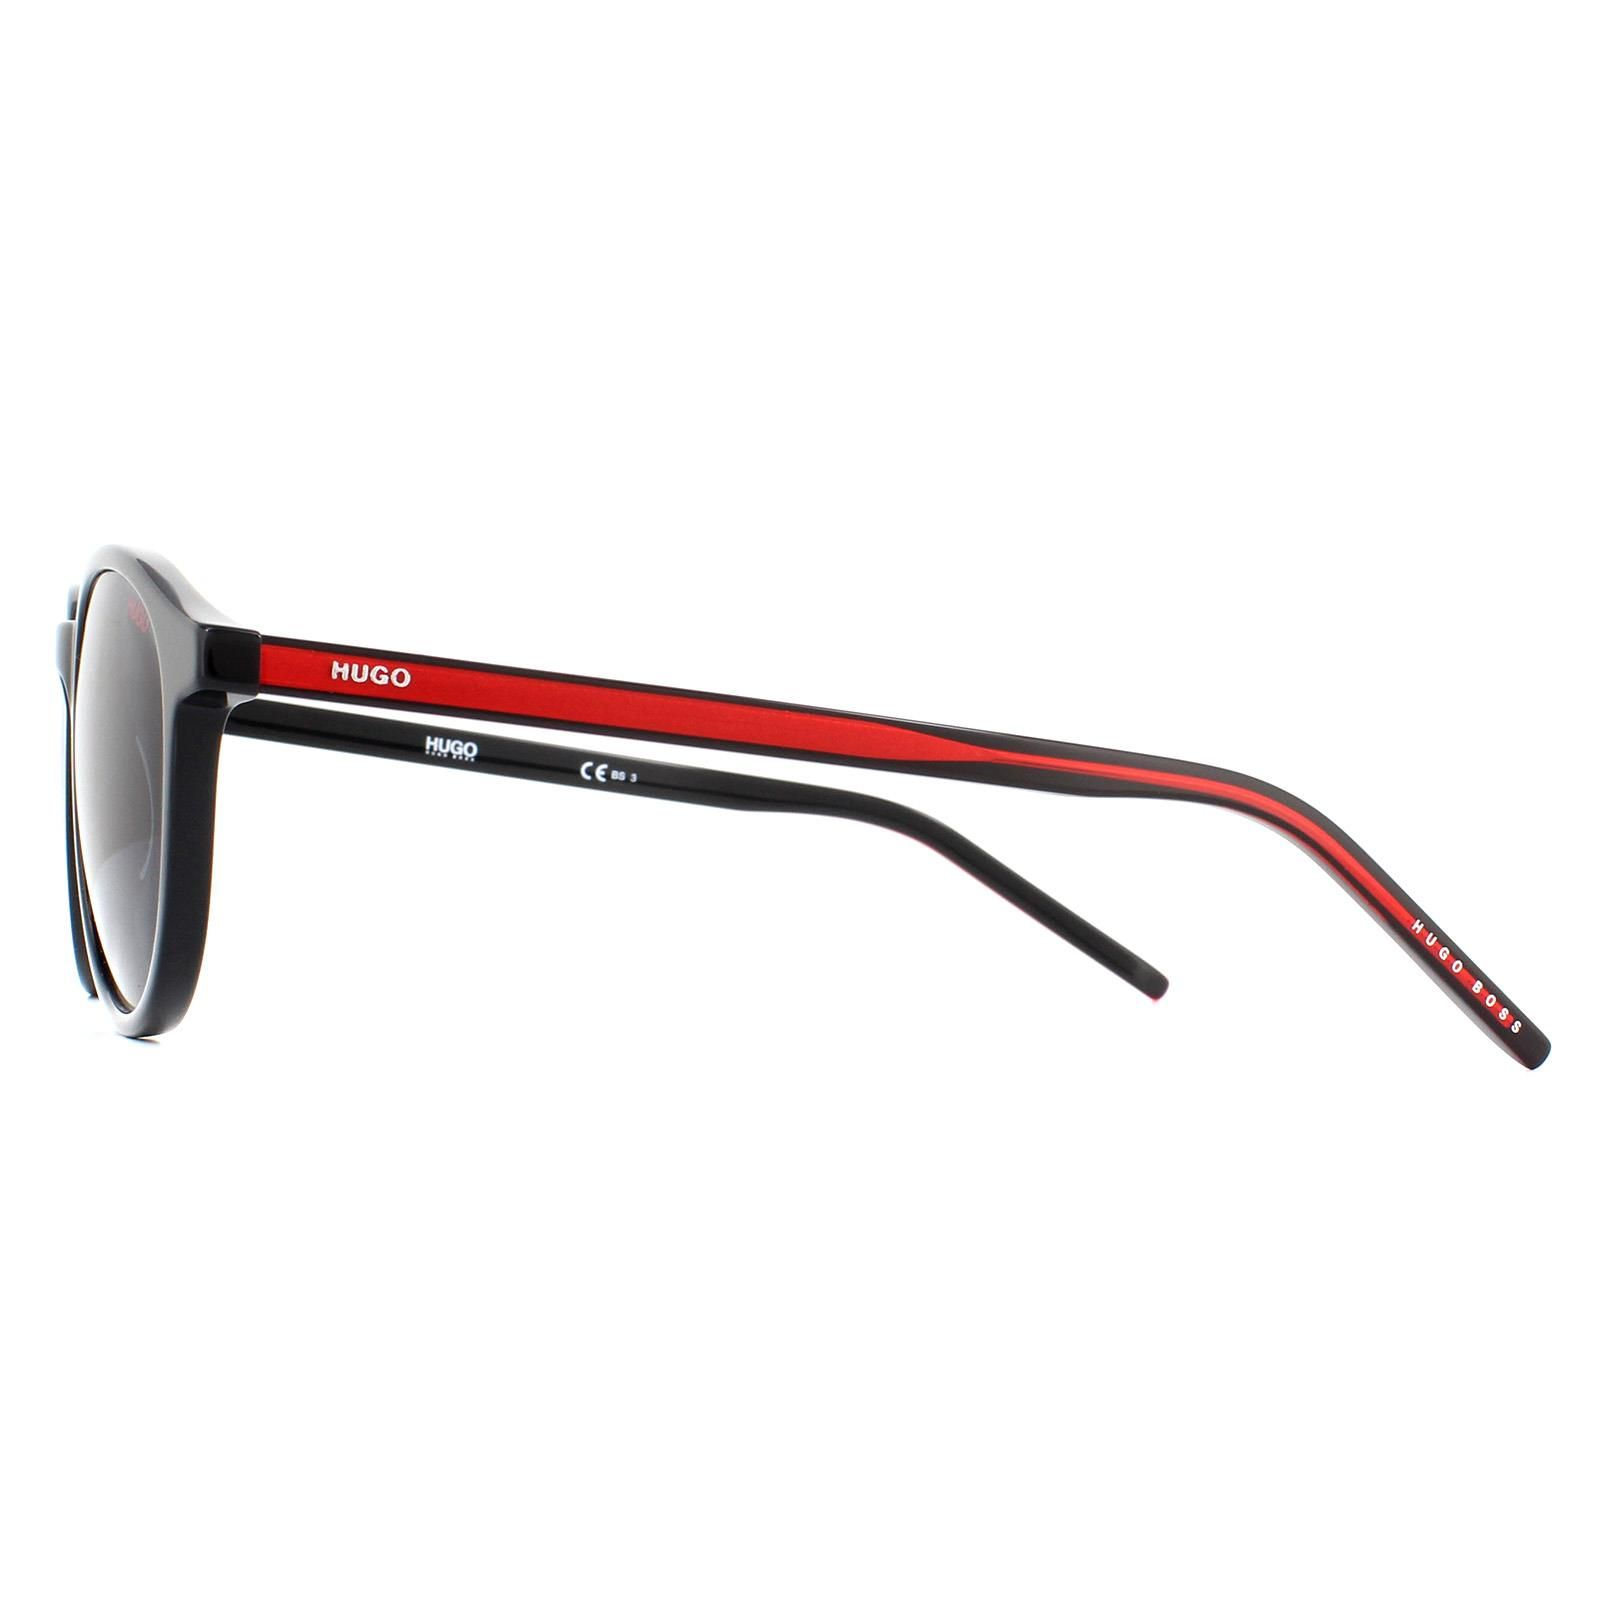 Hugo By Hugo Boss Sunglasses HG 1028/S OIT IR Black Red Grey